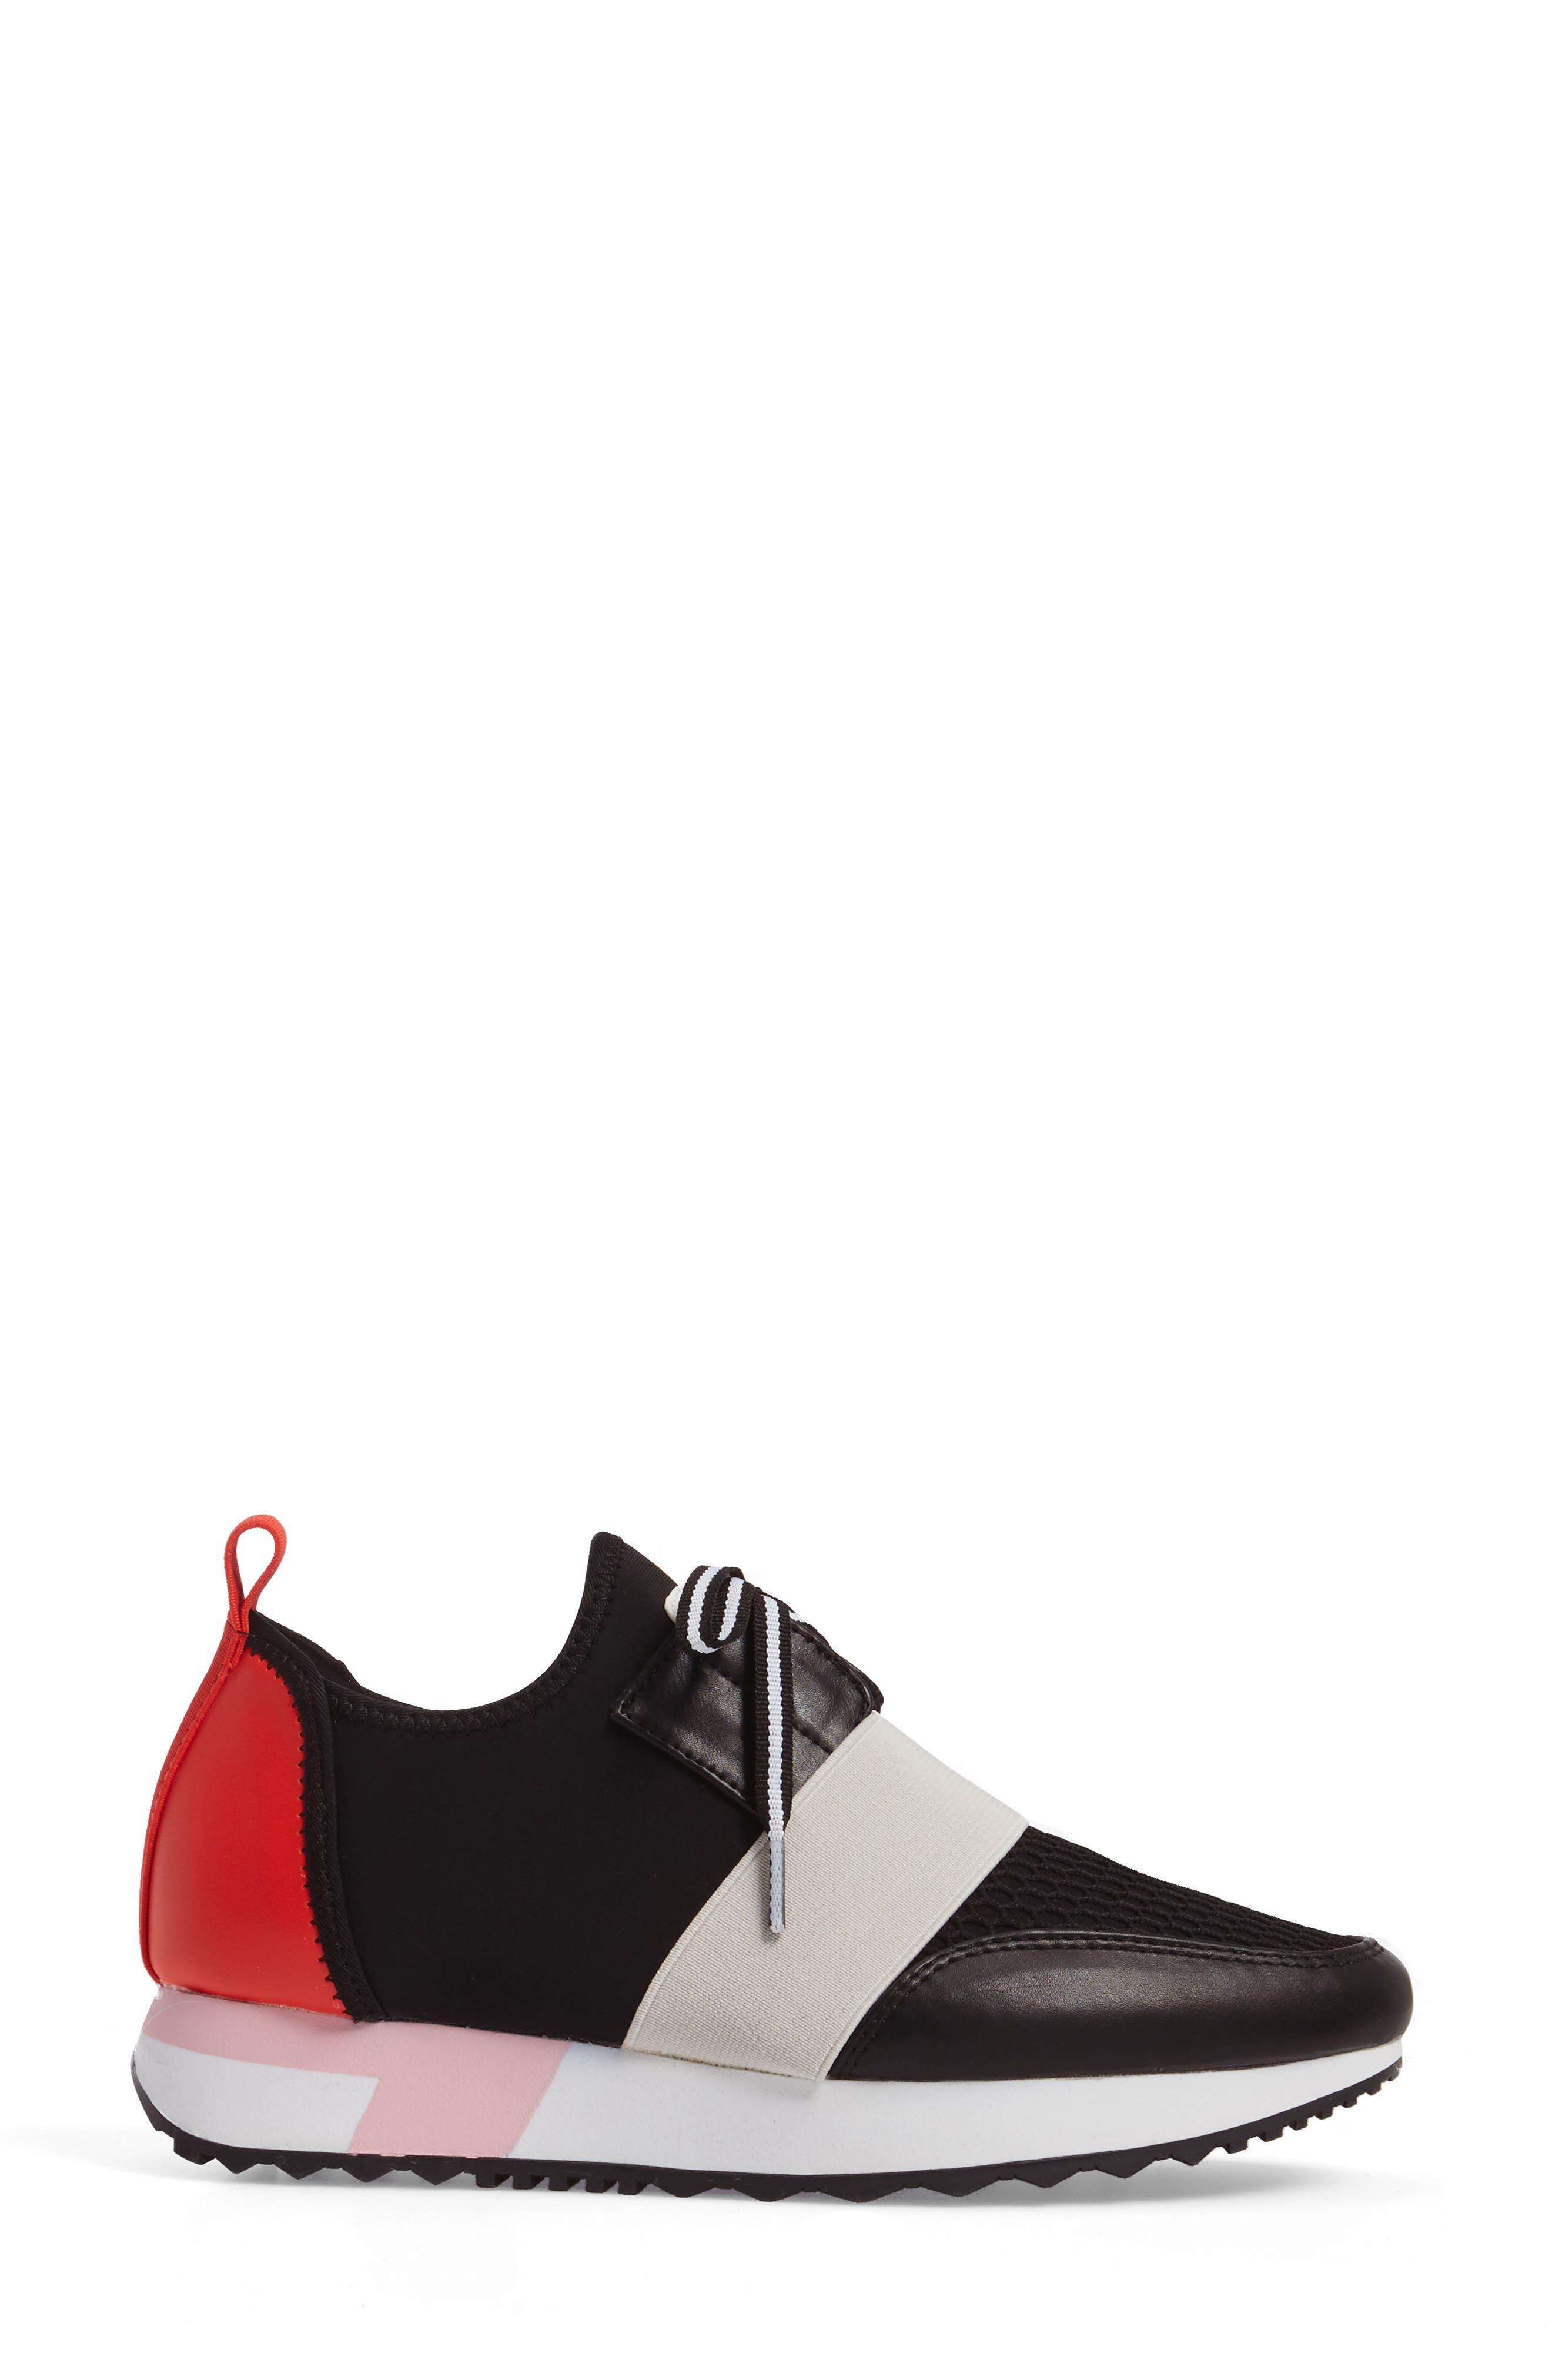 Antics Sneaker,                             Alternate thumbnail 3, color,                             015